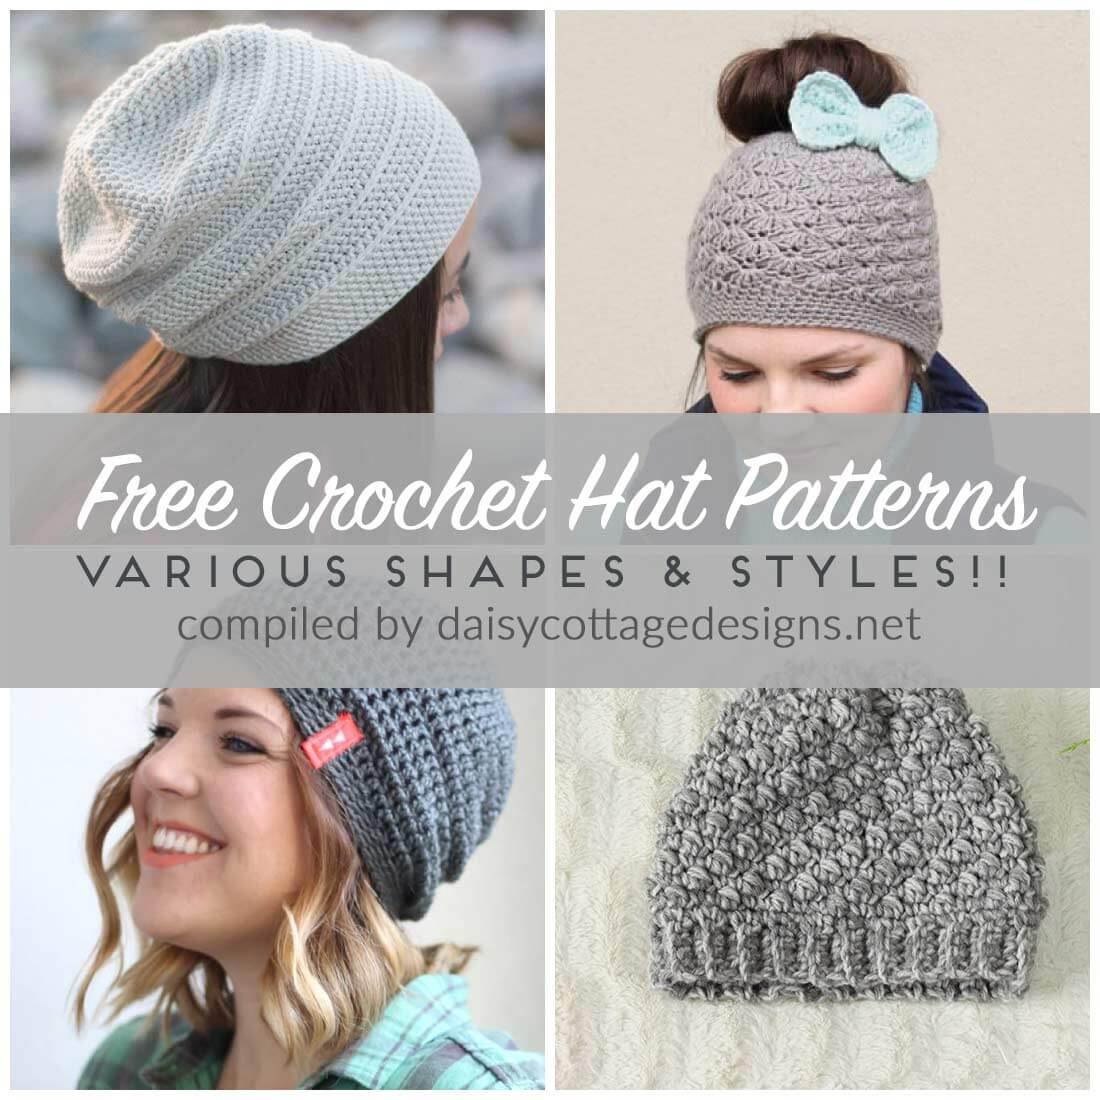 Free Crochet Hat Patterns - Daisy Cottage Designs - Free Printable Crochet Patterns